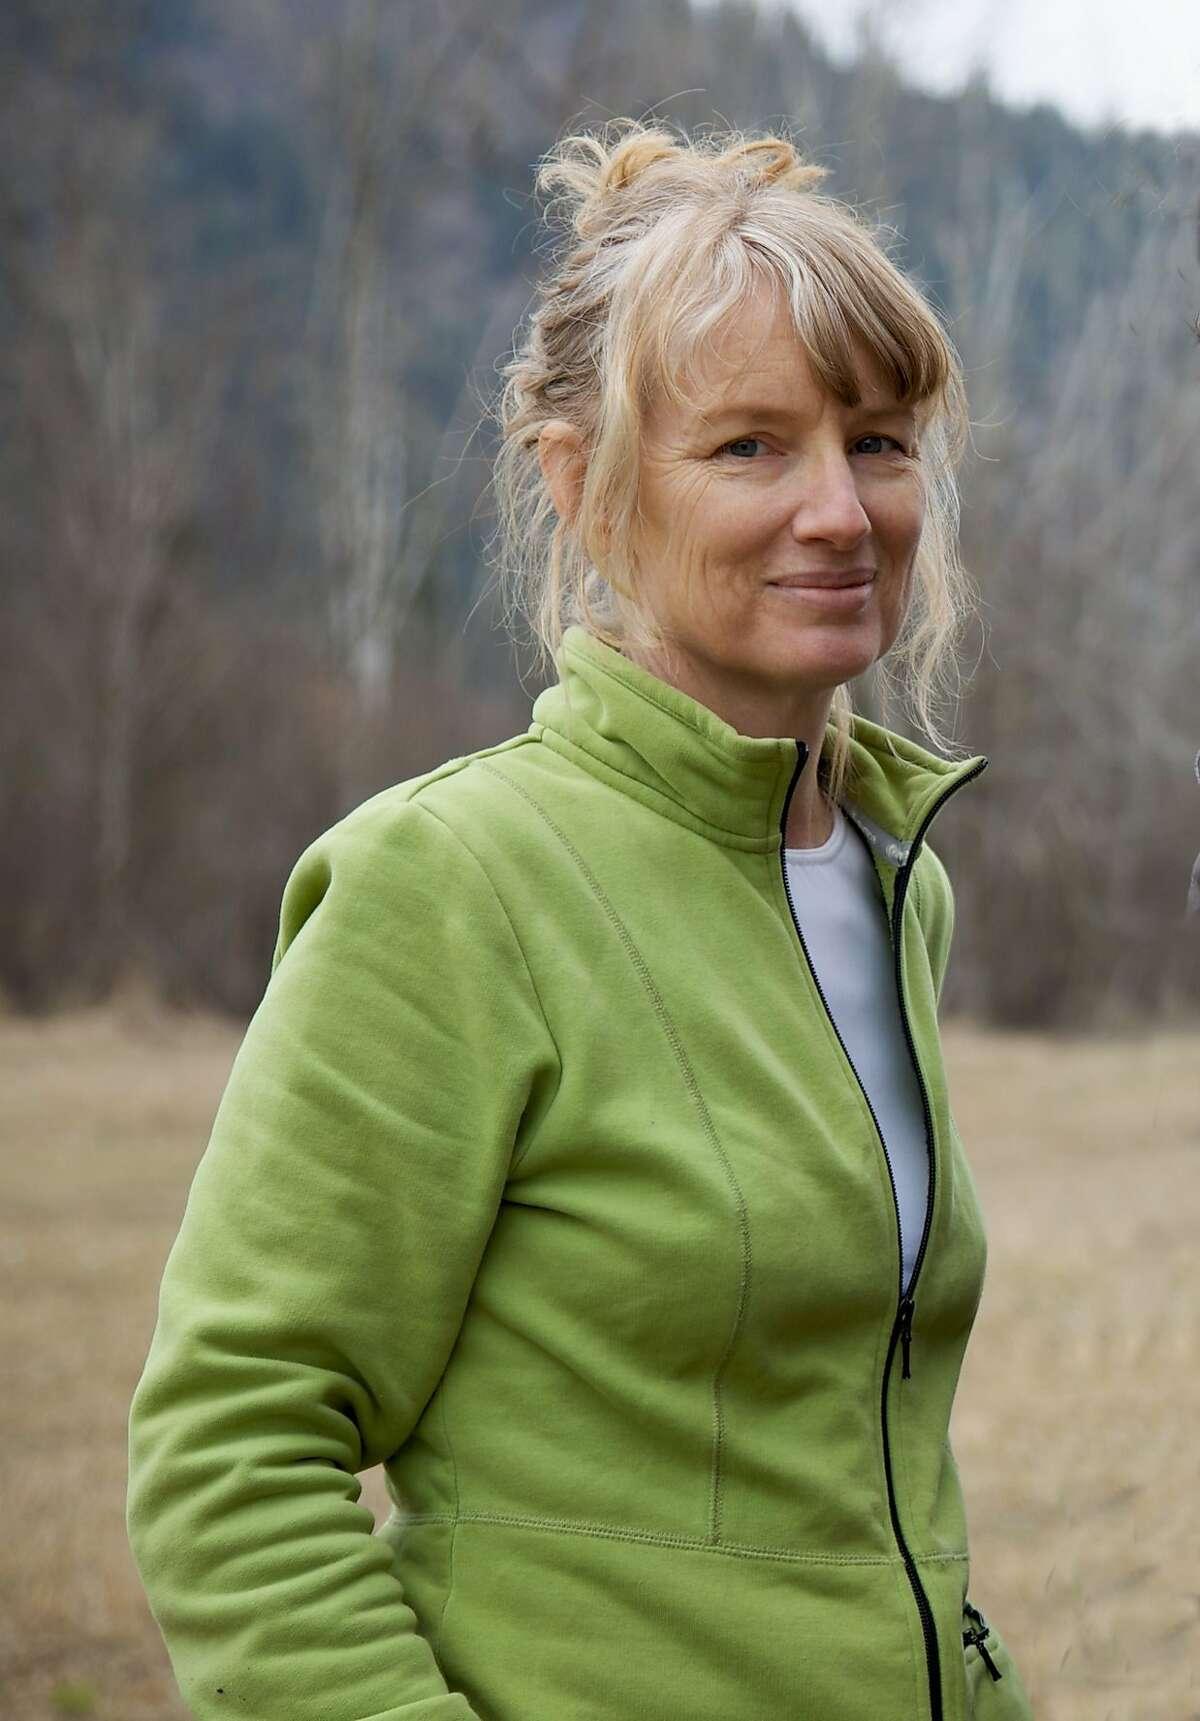 Canadian sound artist Janet Cardiff, whose audio installation